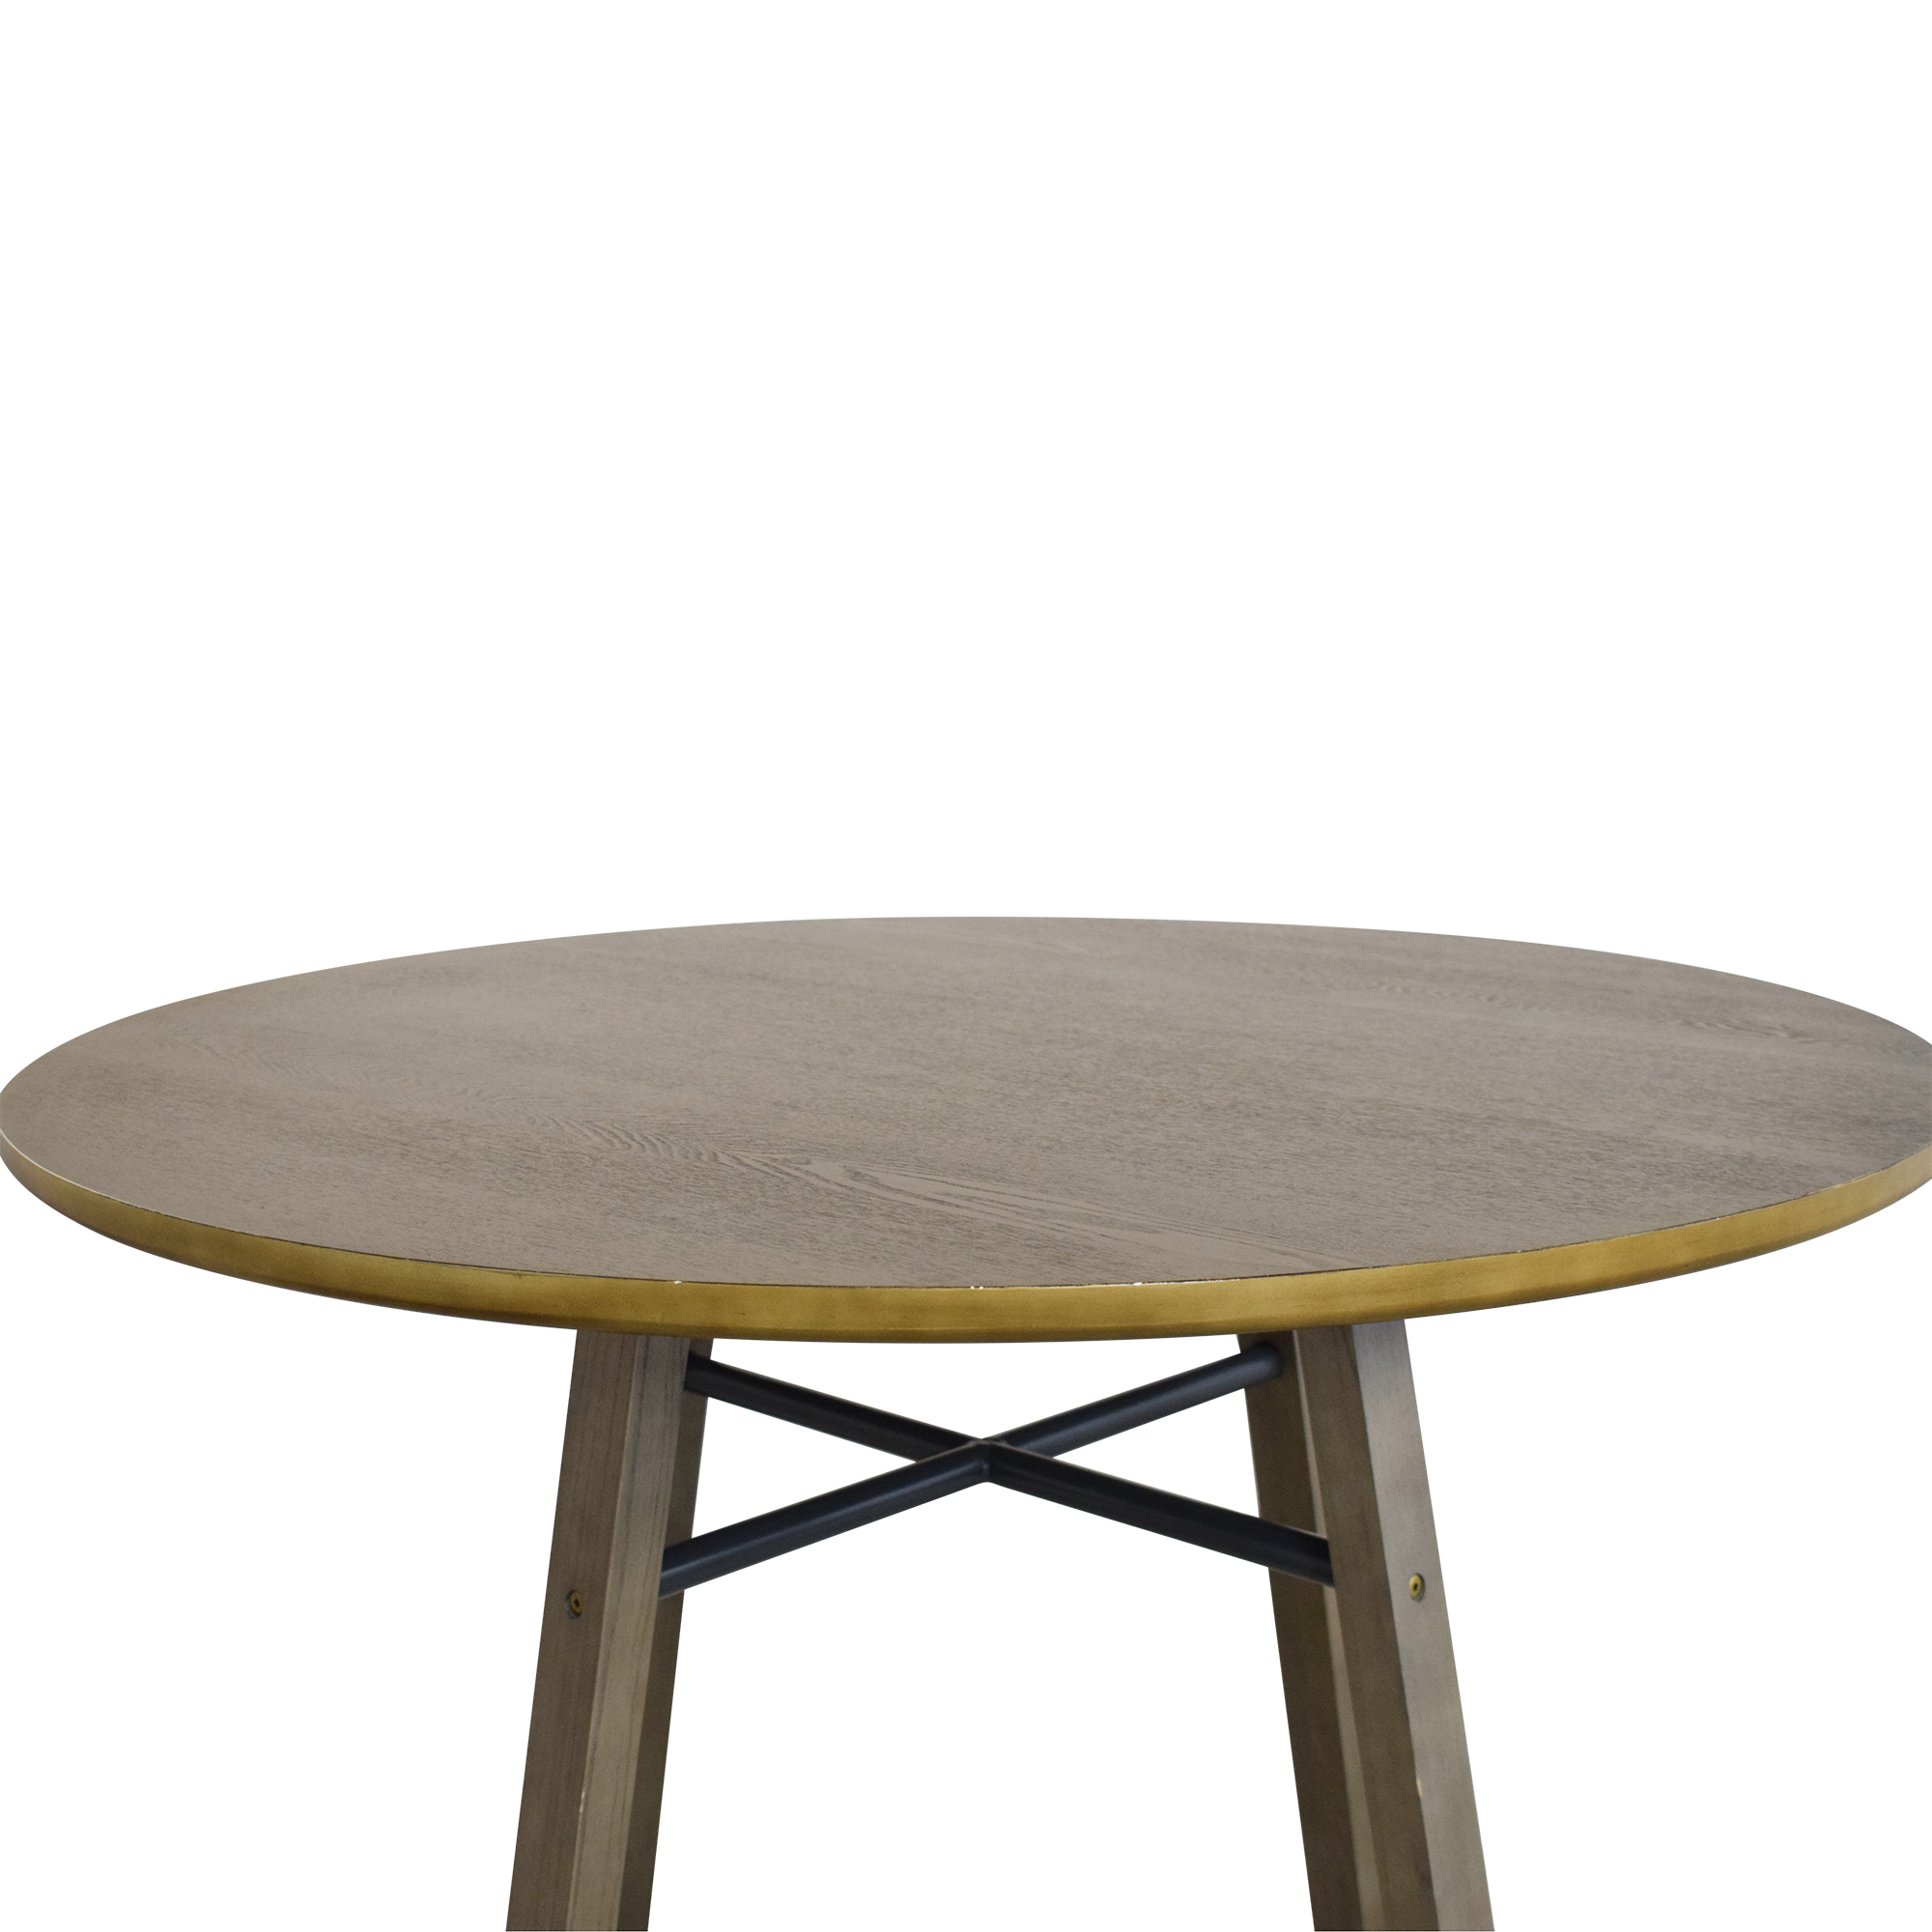 Crate & Barrel Crate & Barrel Dining Table Tables